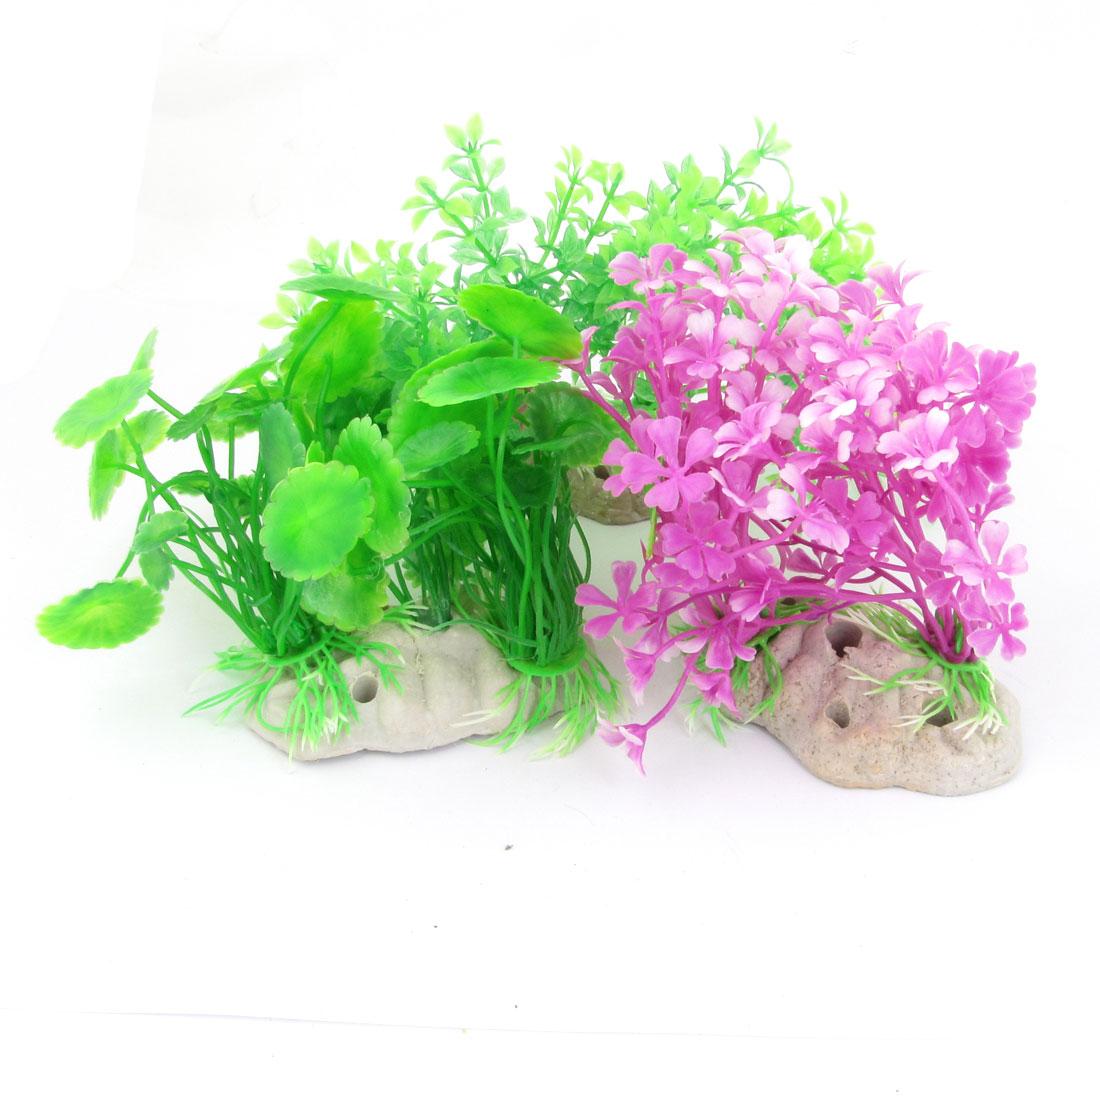 "3pcs Fish Tank Ornament Ceramic Base Fuchsia Green Plastic Plant 7.9"" Wide"